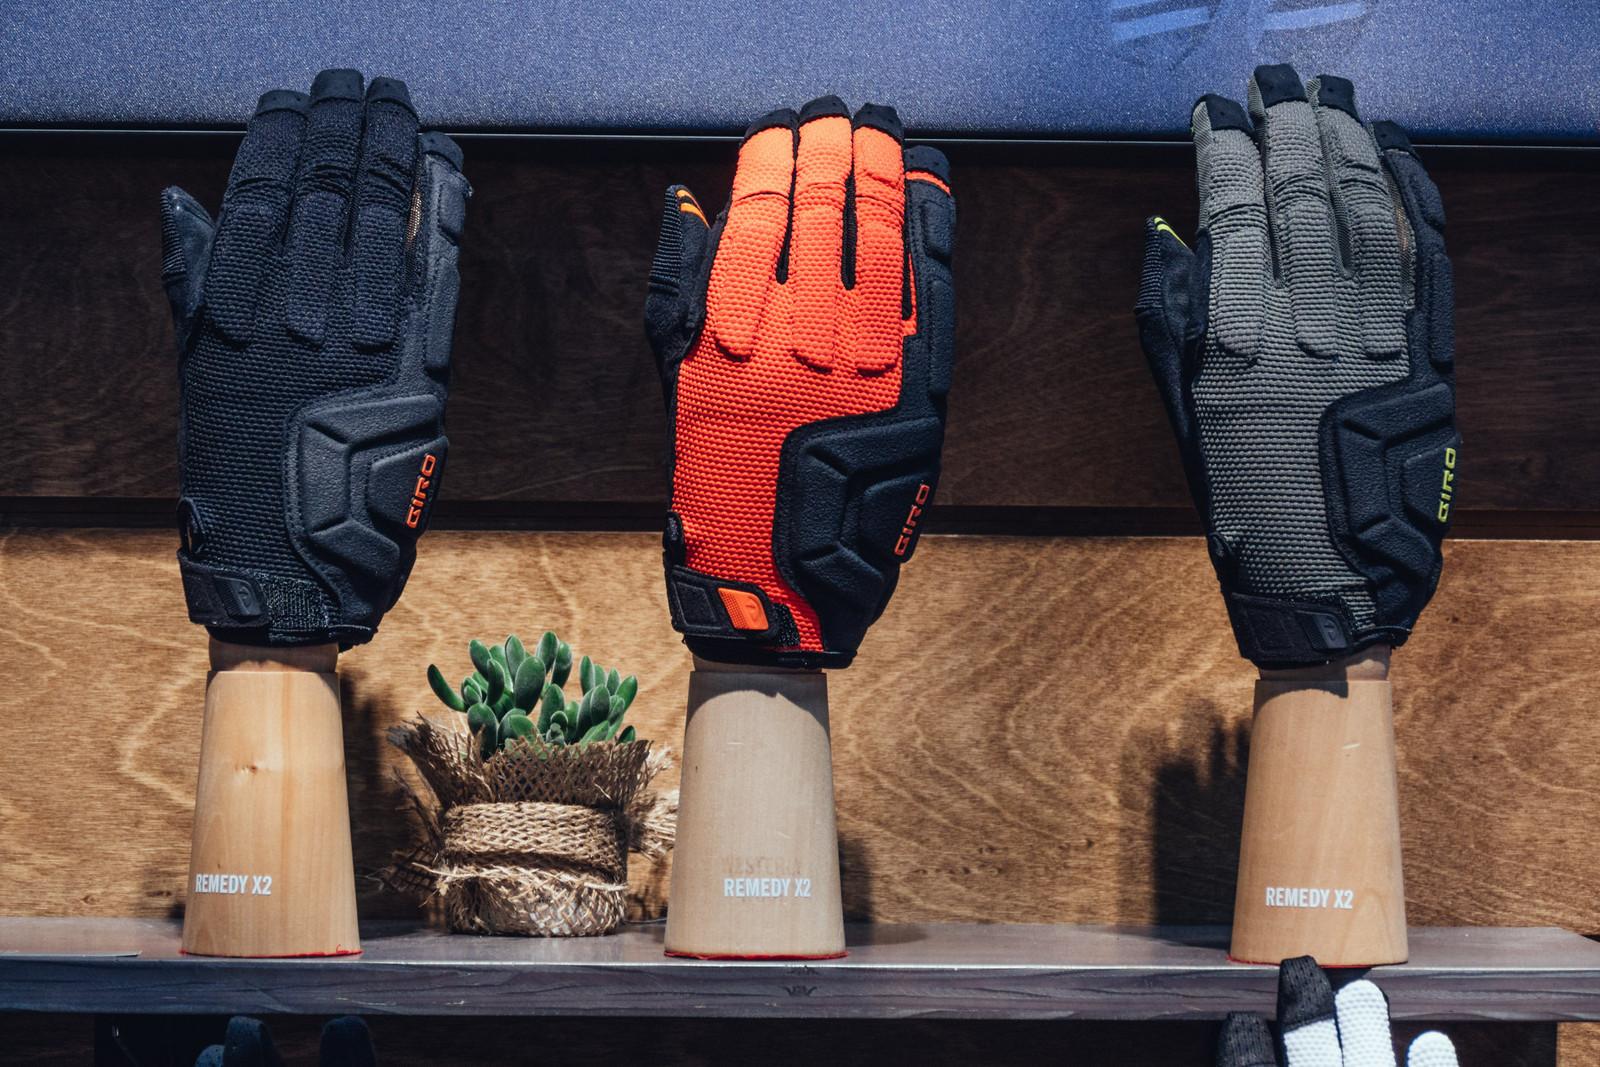 Giro Remedy X2 Glove - INTERBIKE - 2017 Mountain Bike Apparel and Protective Gear - Mountain Biking Pictures - Vital MTB